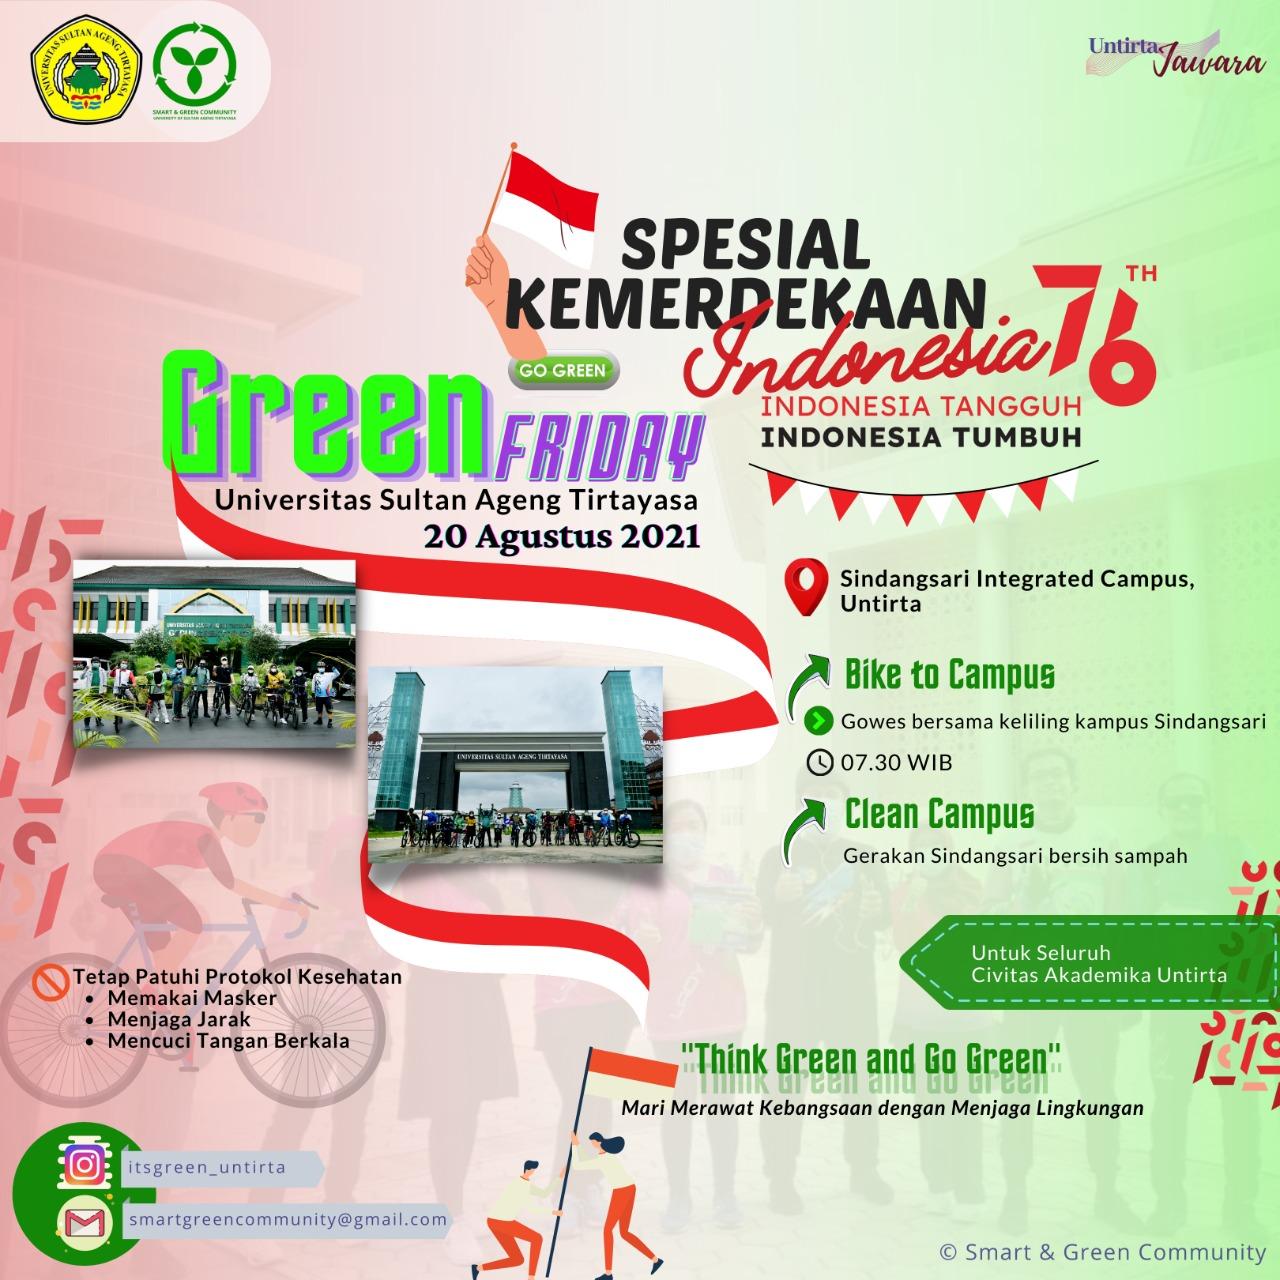 UNTIRTA Green Friday 20 Agustus 2021 (HUT 76 Tahun Republik Indonesia)